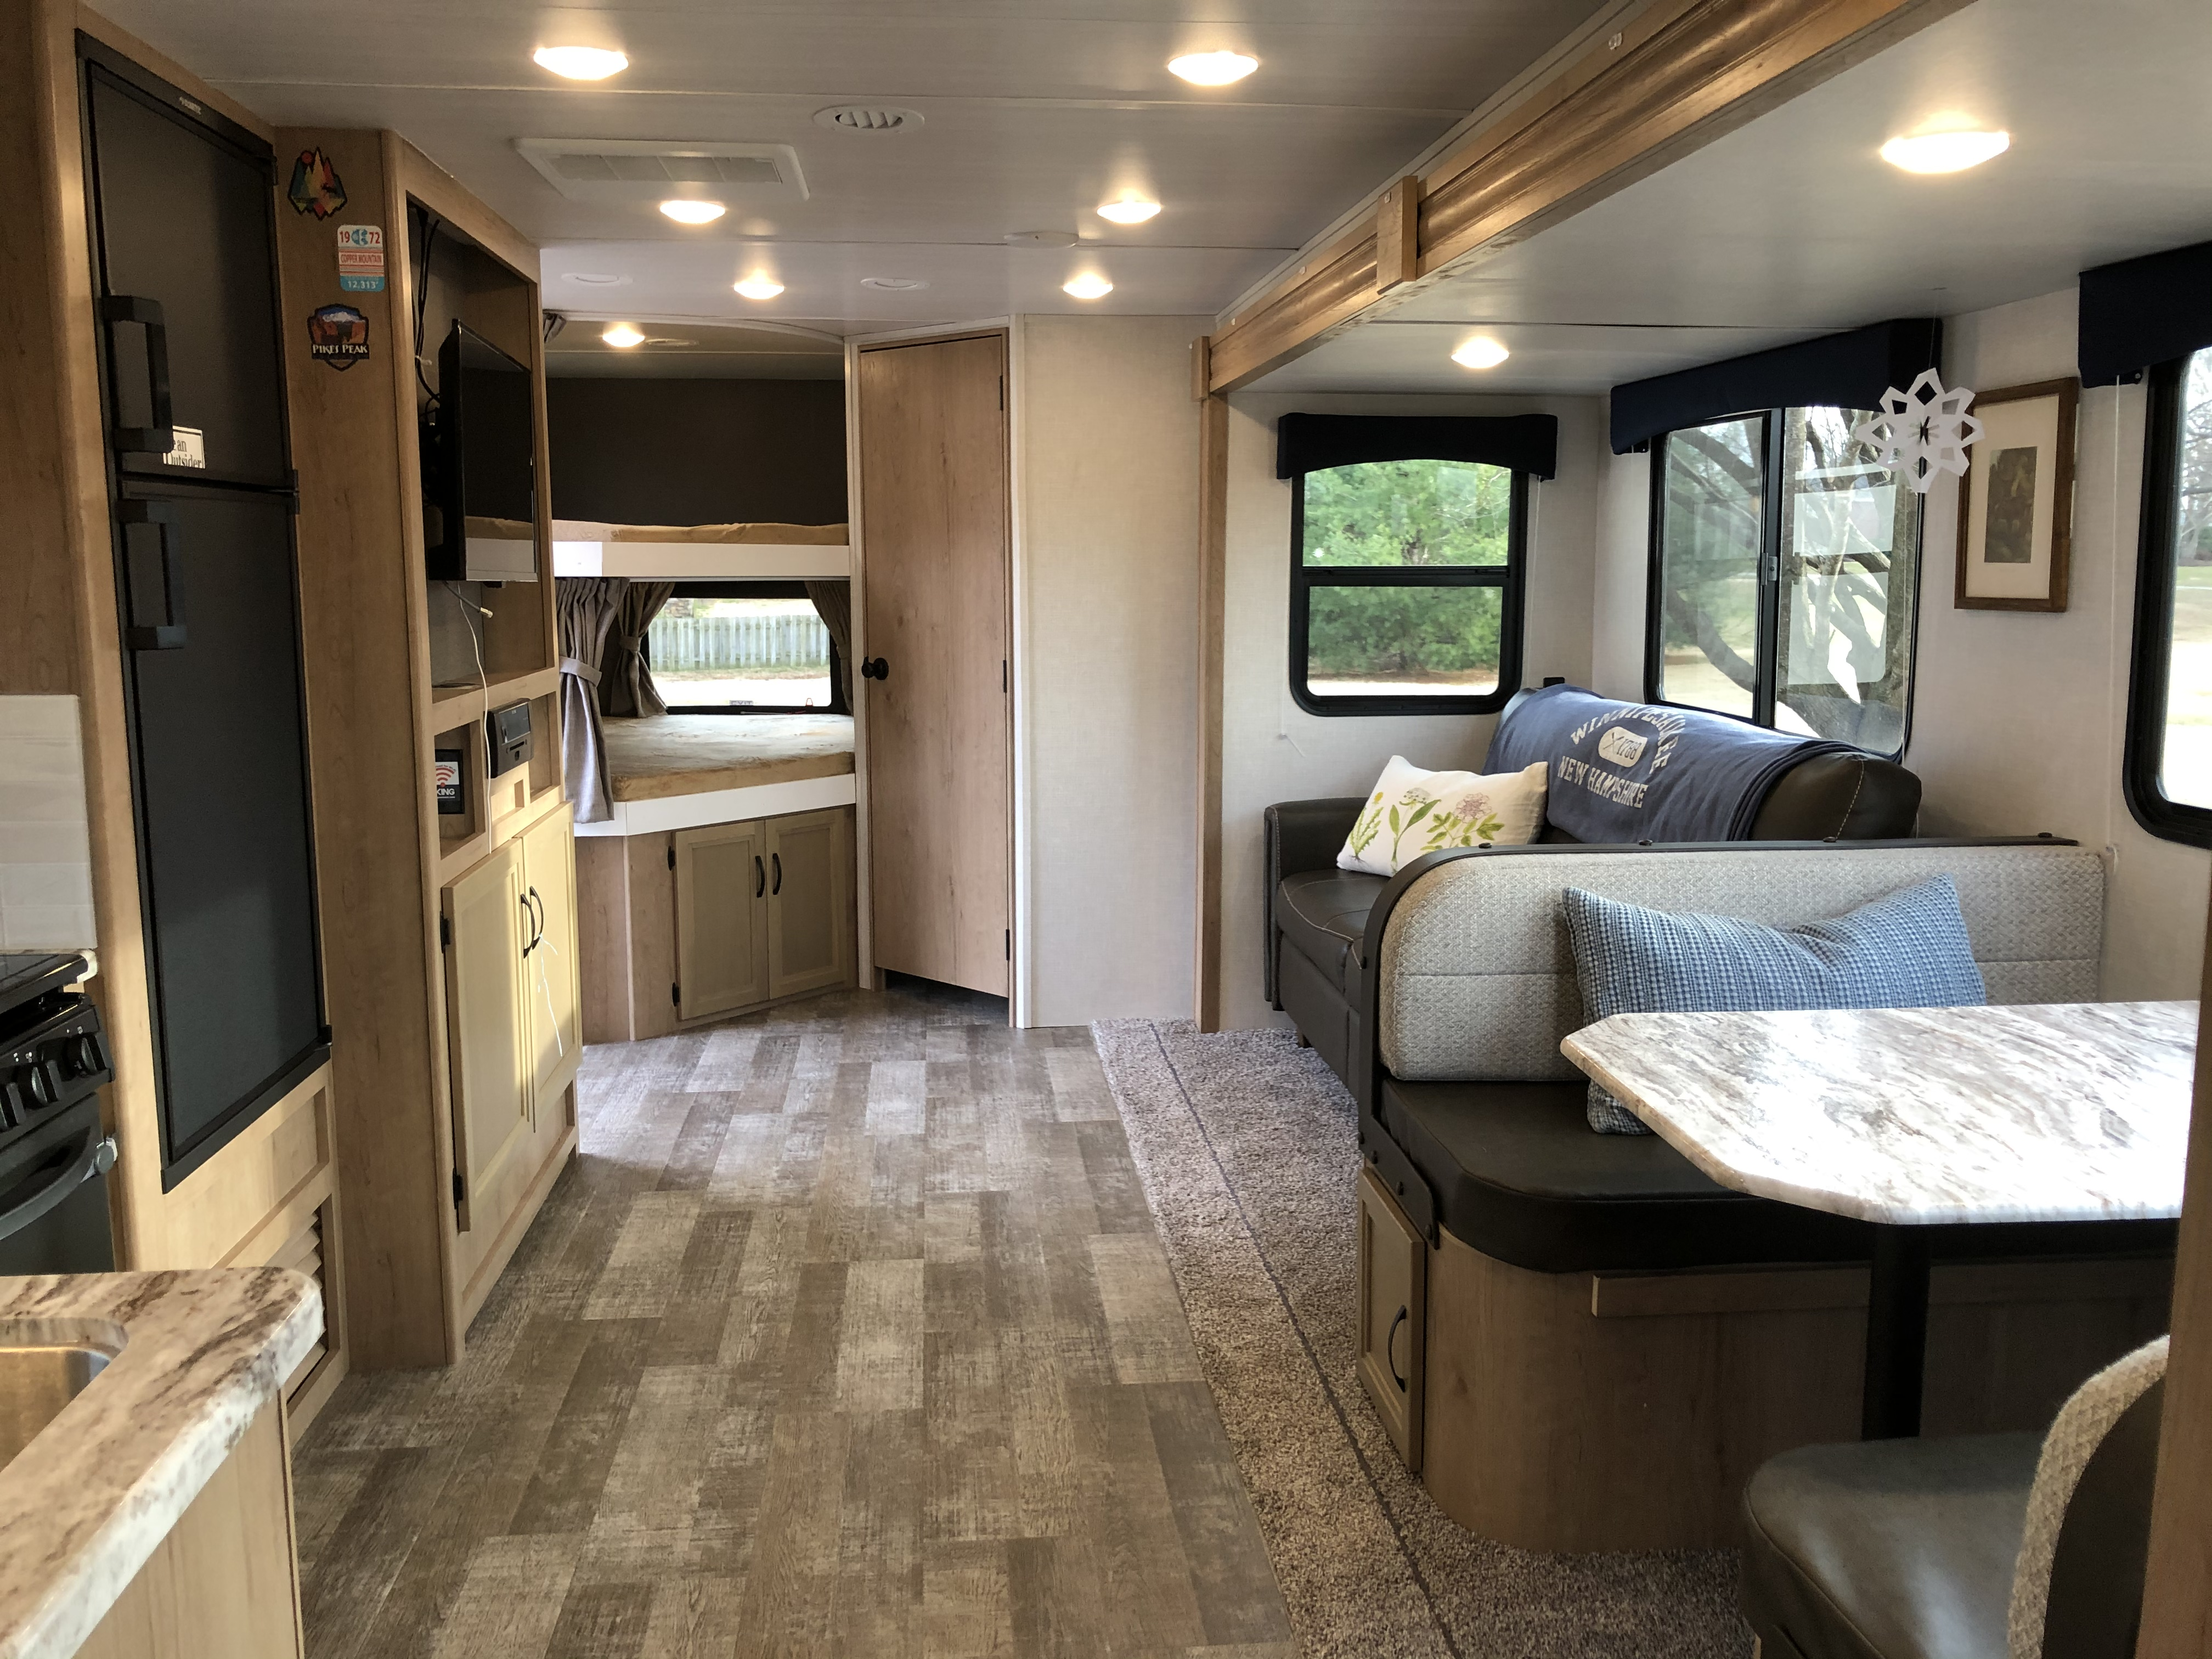 Double sized bunks fits two kids per bunk!. Winnebago Minnie 2020